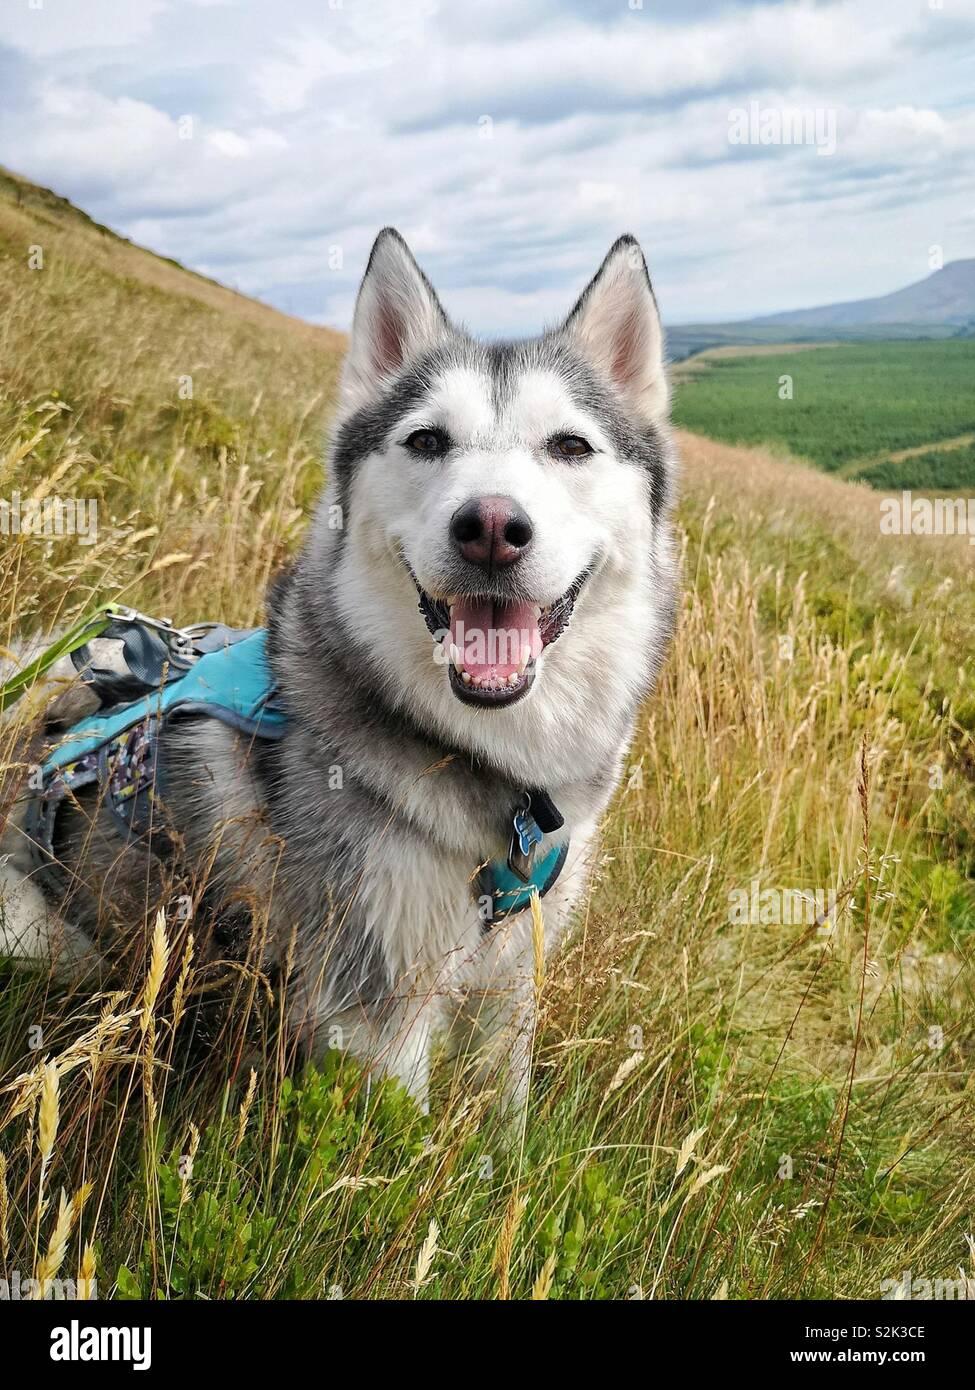 Husky Hund im Feld in den Hügeln von Schottland Stockbild